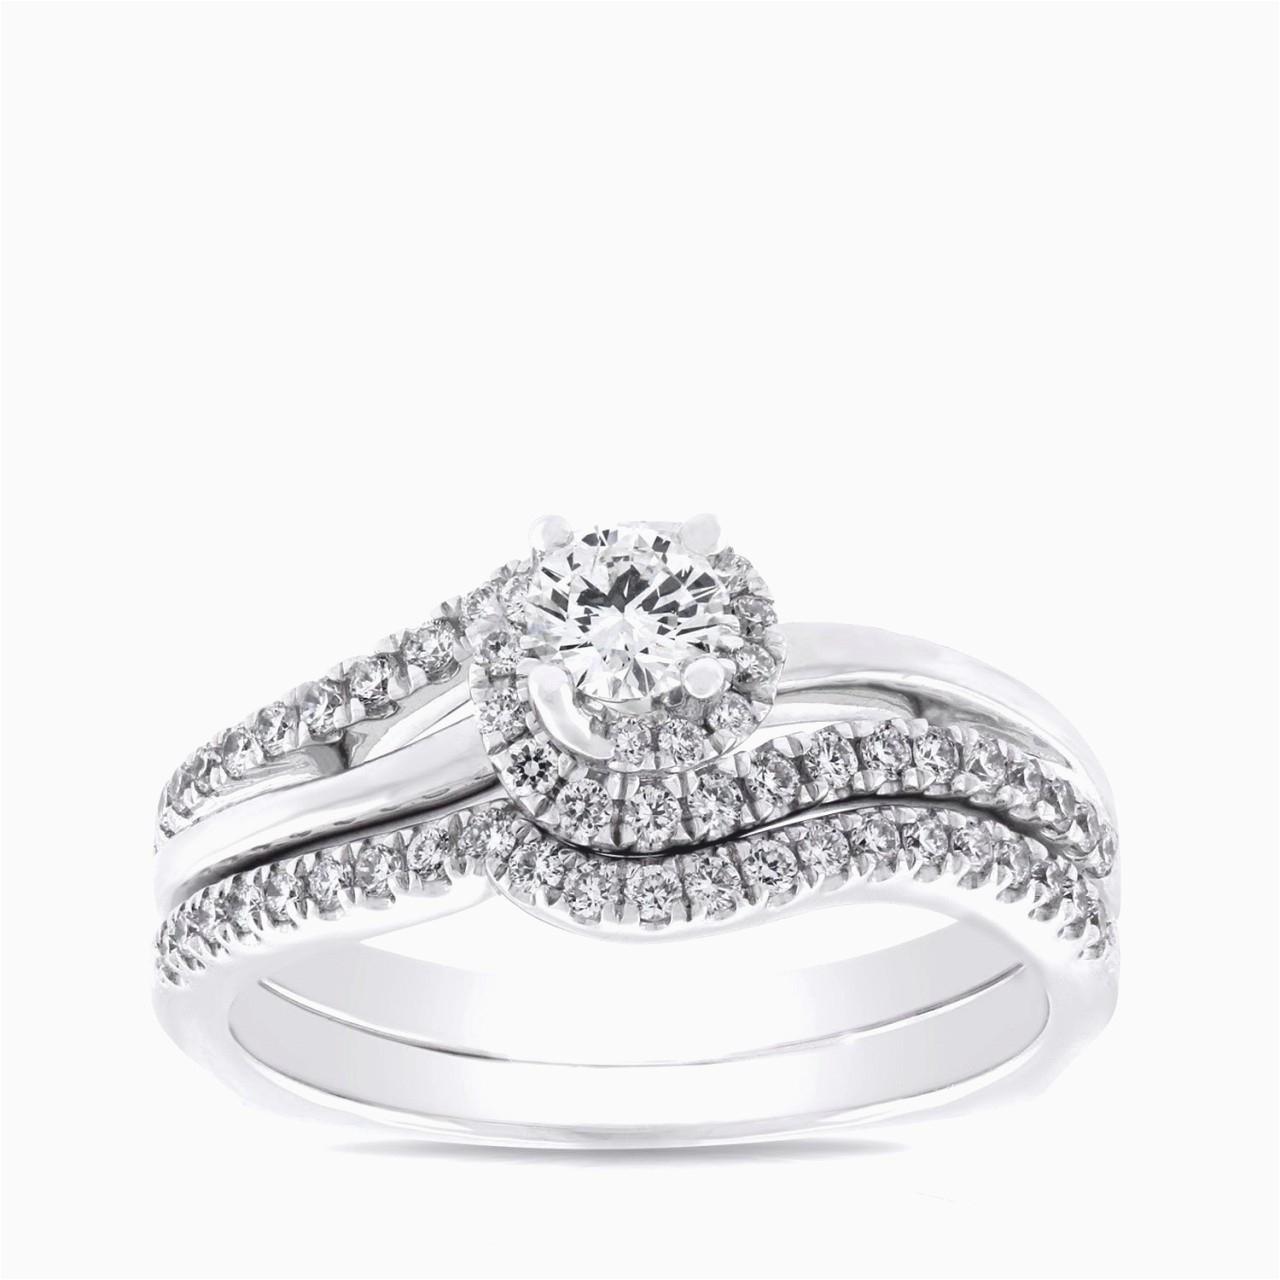 Light Blue Diamond Engagement Rings 23 Beautiful Of Light Blue Diamond Ring Hashdron Diamonds